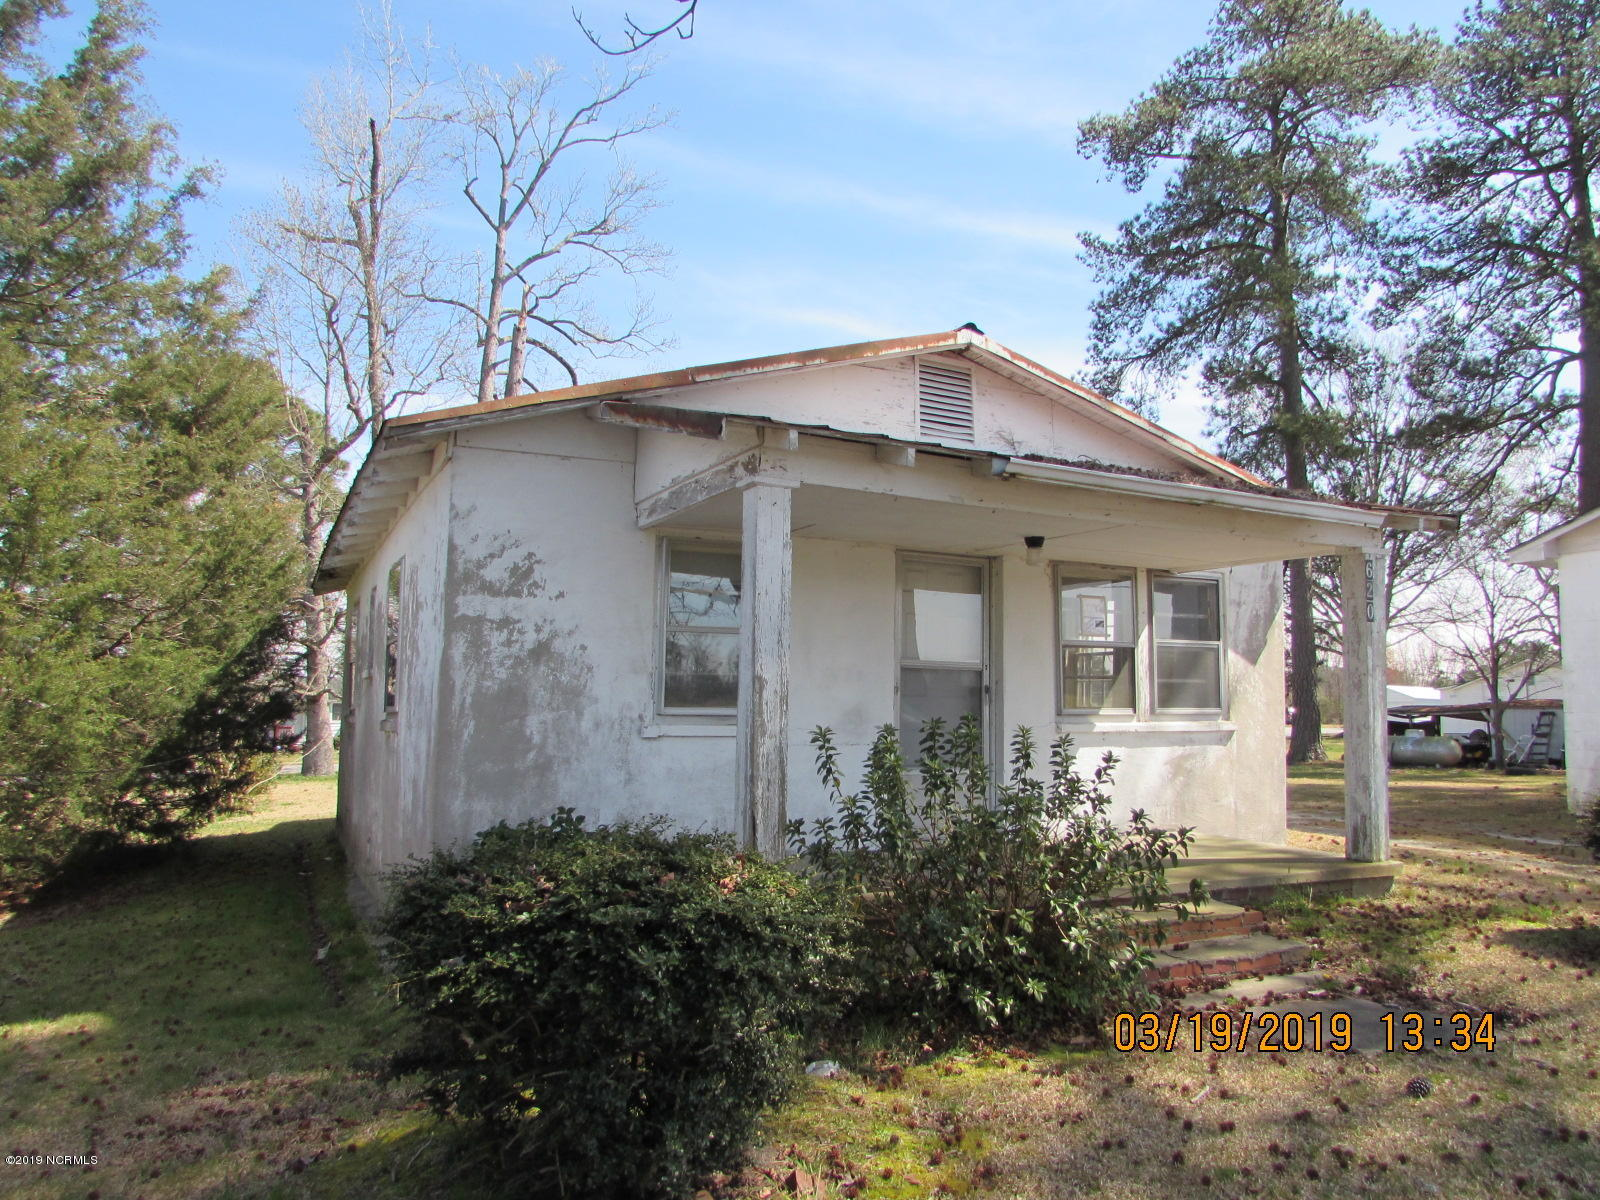 620 Railroad Street, Macclesfield, North Carolina, 2 Bedrooms Bedrooms, 4 Rooms Rooms,1 BathroomBathrooms,Single family residence,For sale,Railroad,100158061